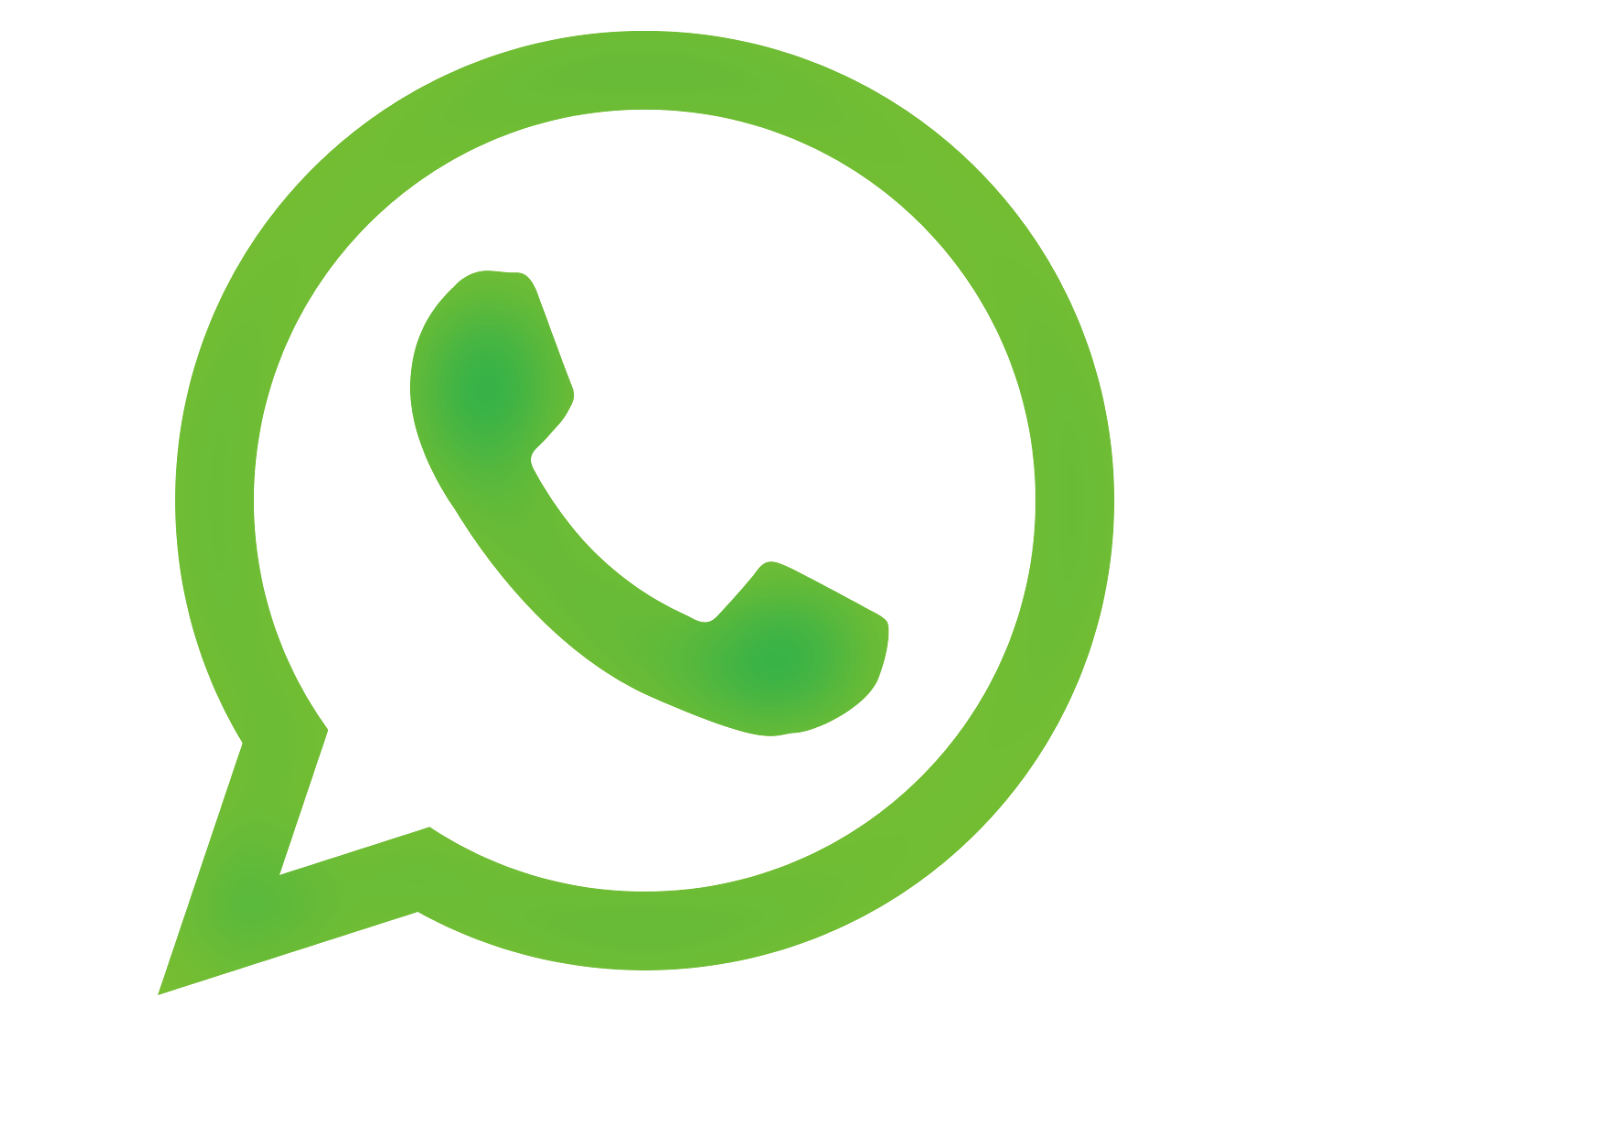 logo-whatsapp-png-transparente10